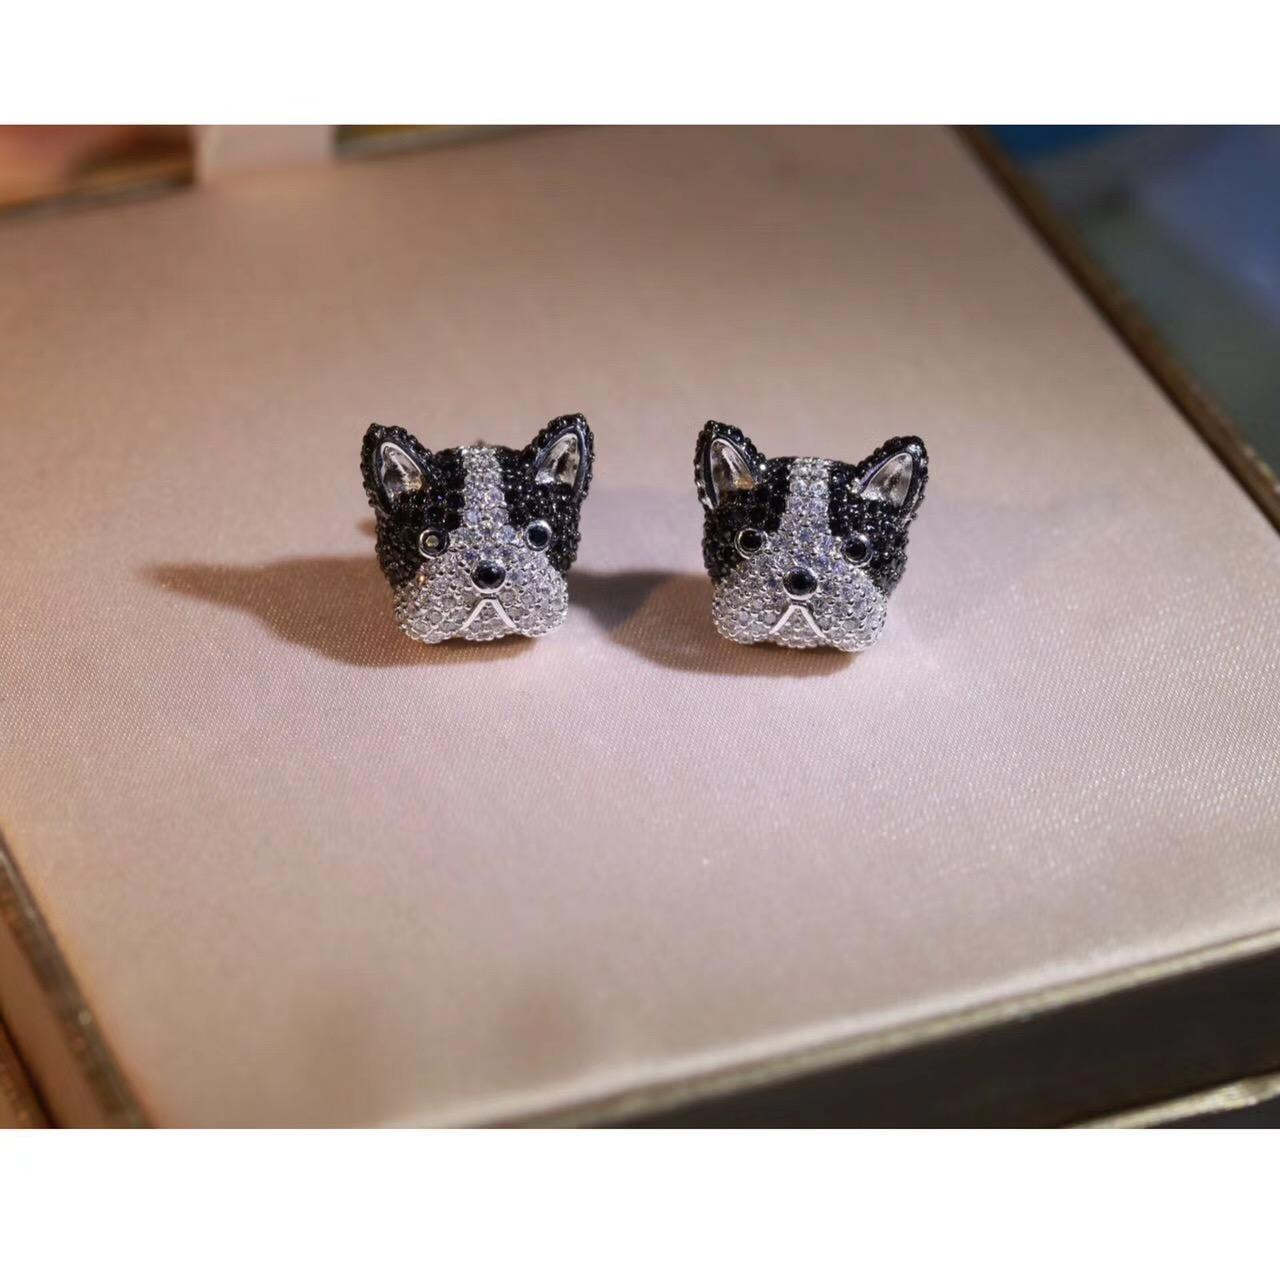 Fashion-Oil Animal French Bulldog Akita dog Bichon frise Siberian Husky Cute Puppy Dog Stud Earrings boucle d'oreille femme Sterling Silver